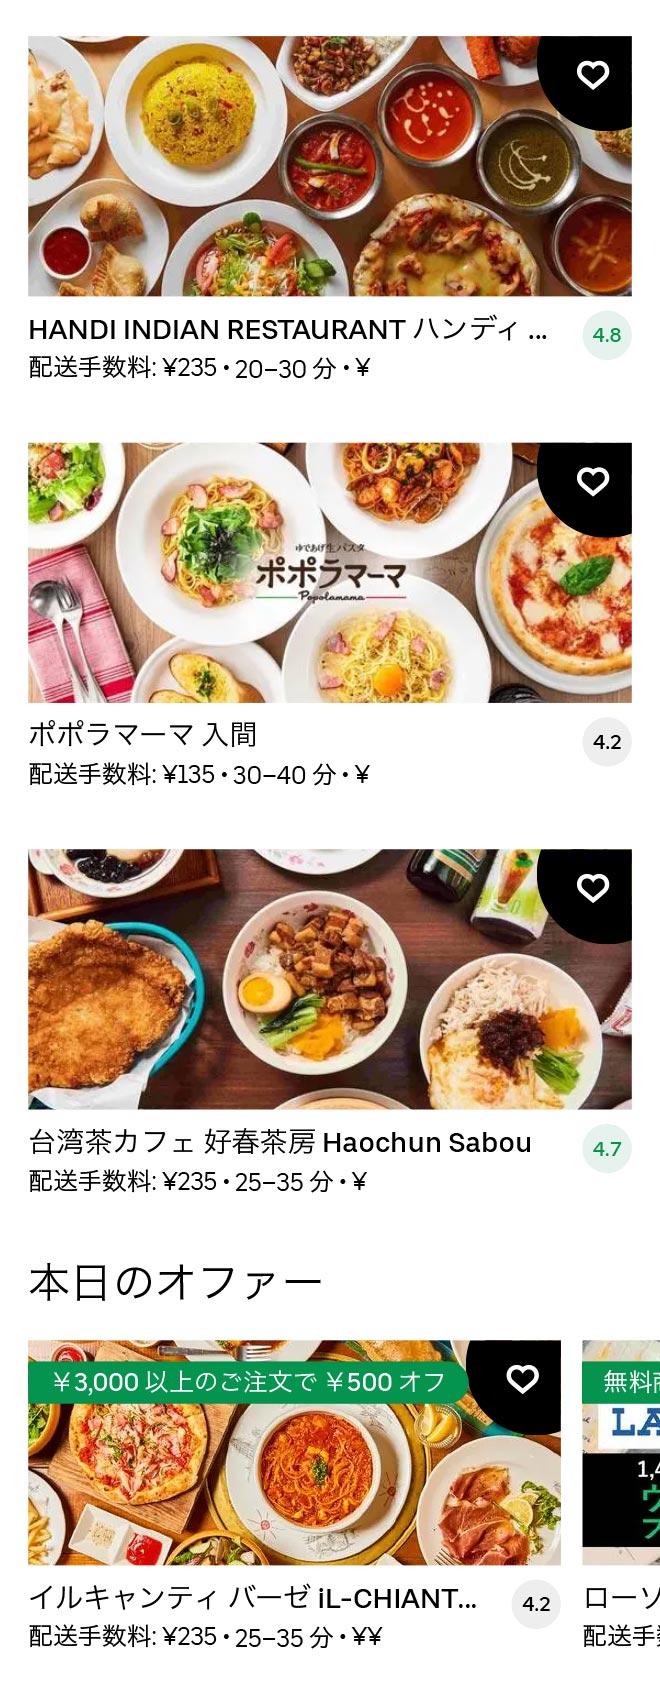 Iruma menu 2101 02